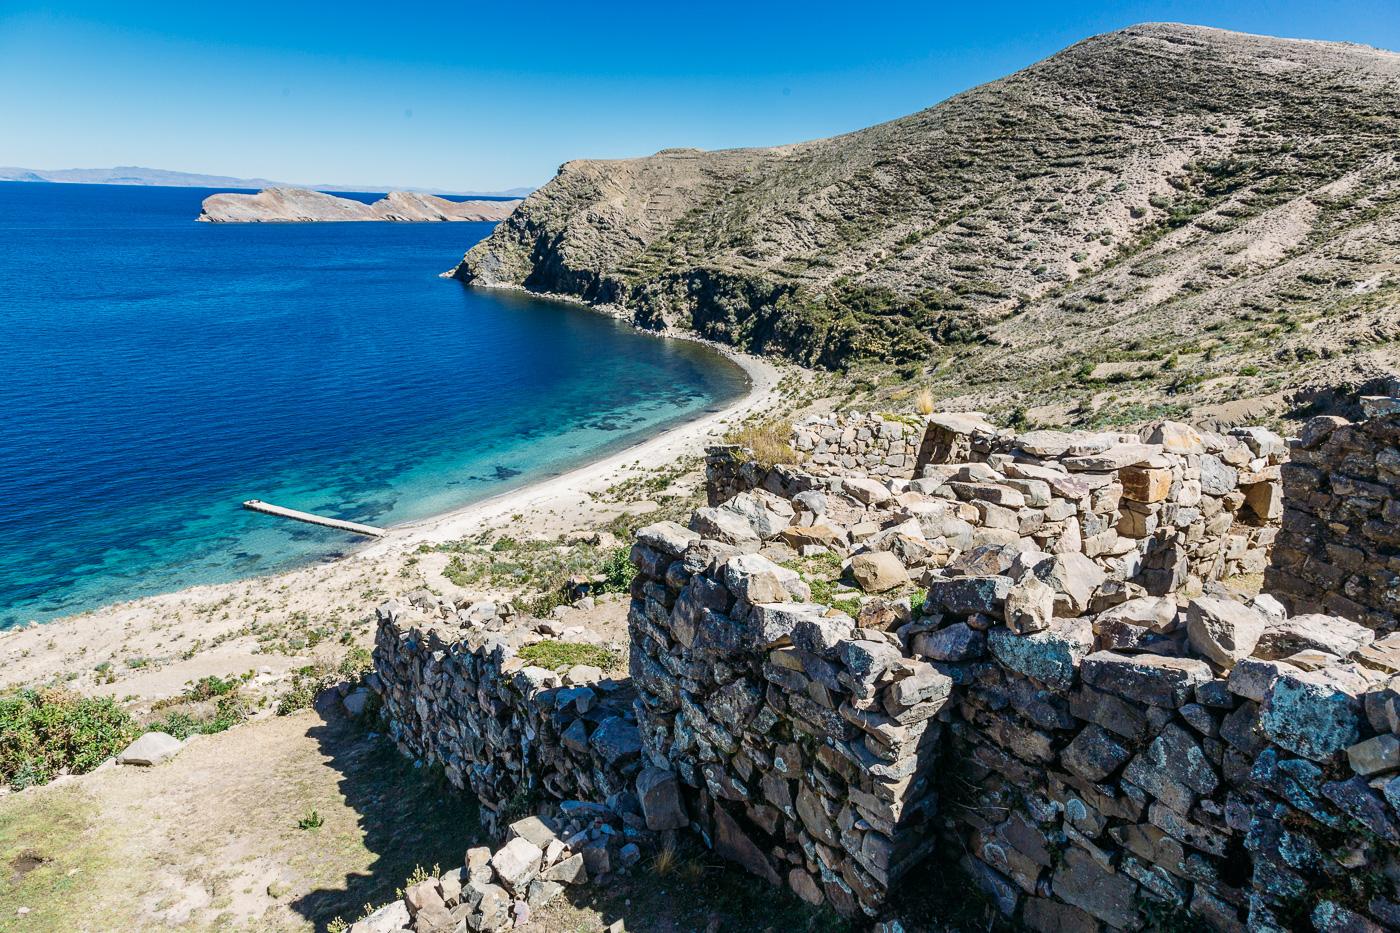 Isla Del Sol Incan Ruins, Lake Titicaca Bolivia July 2015